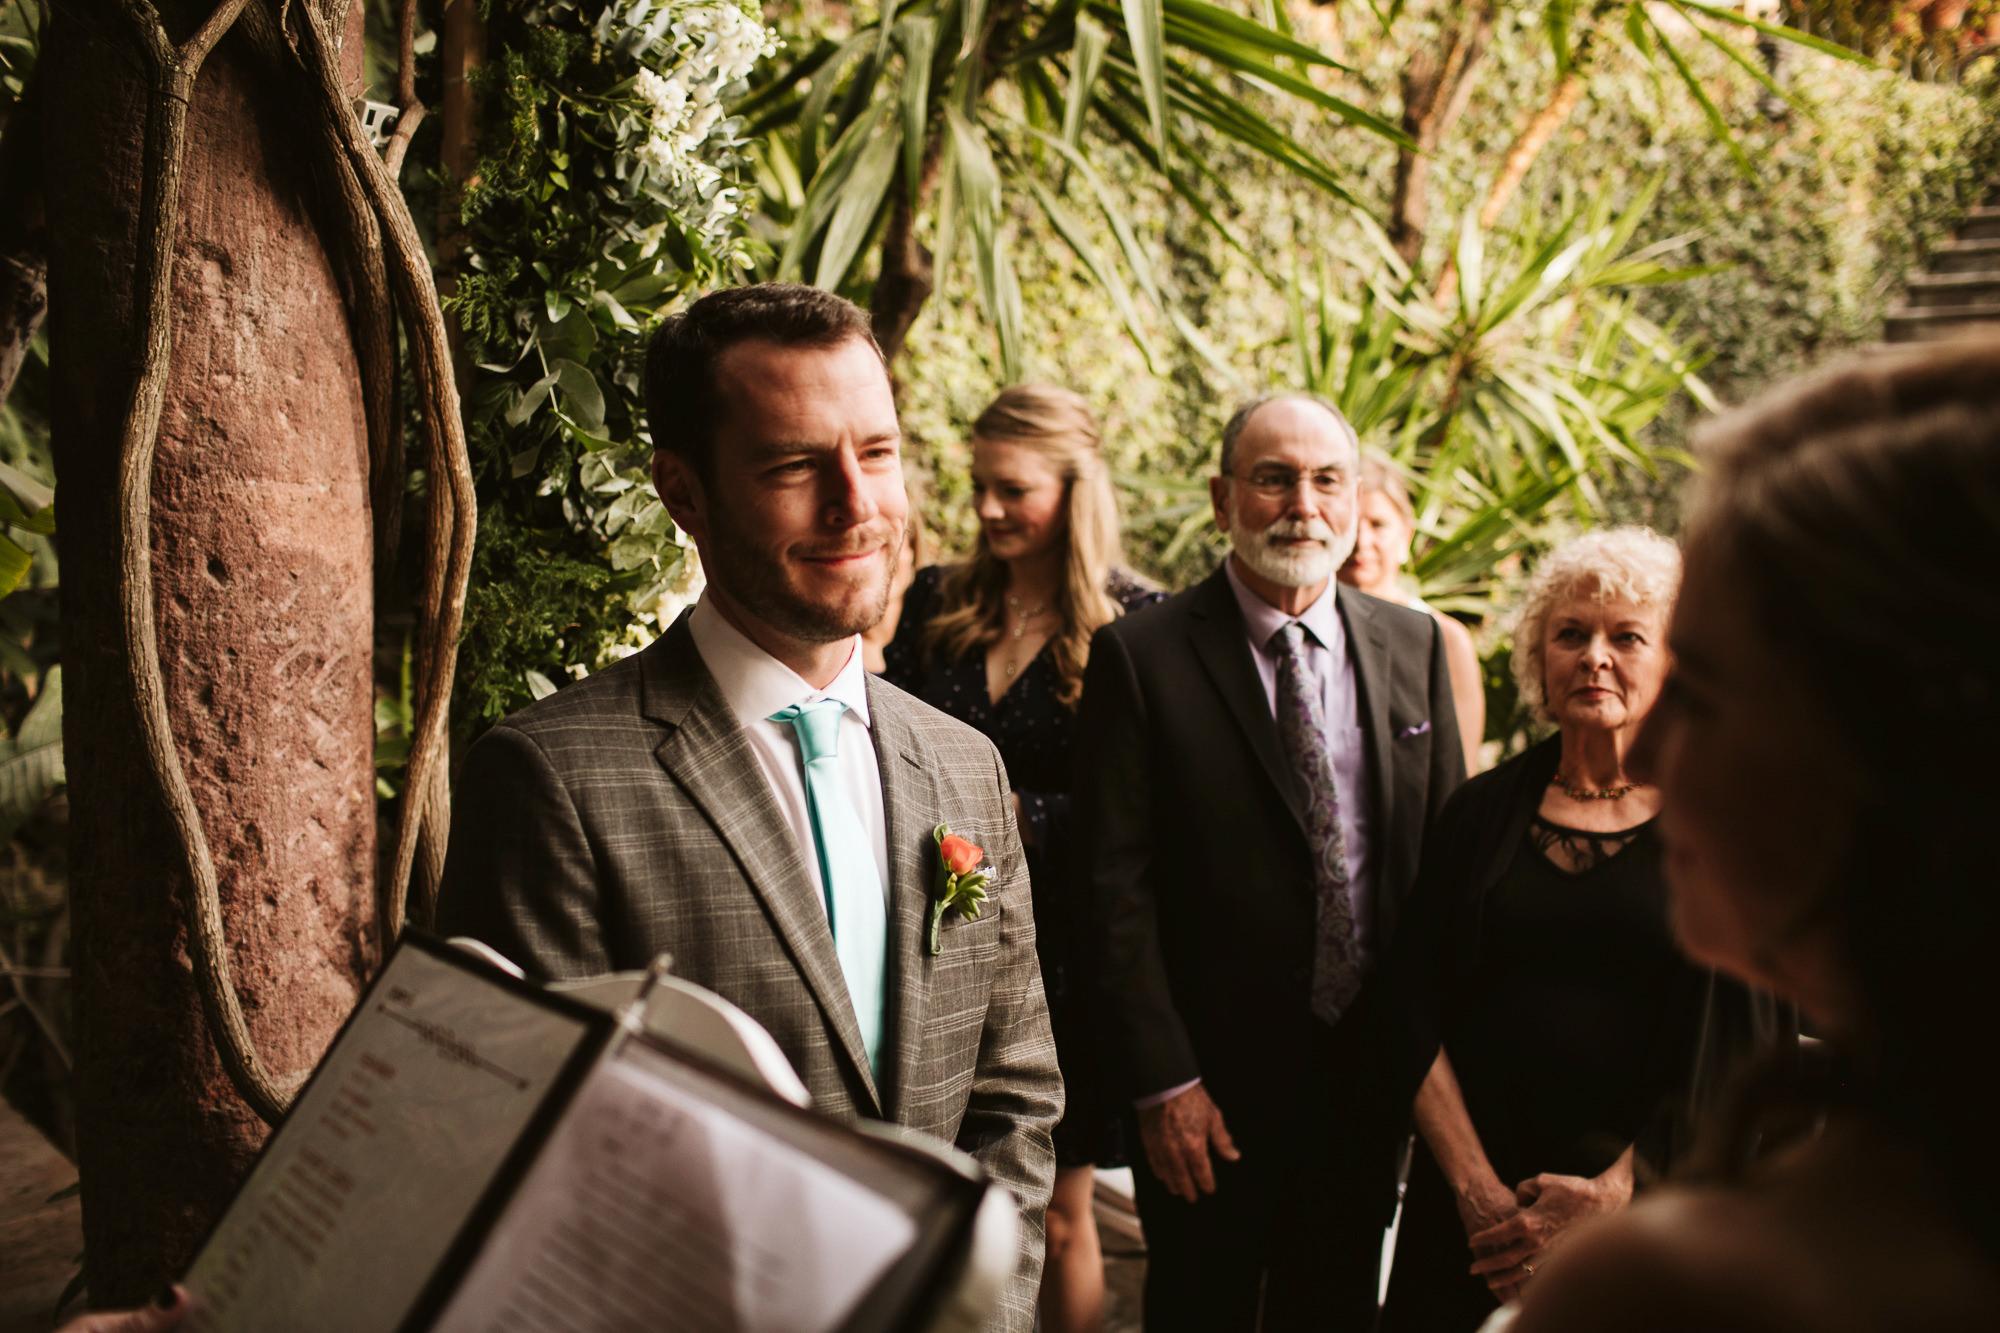 Destination-wedding-photographer-101.jpg